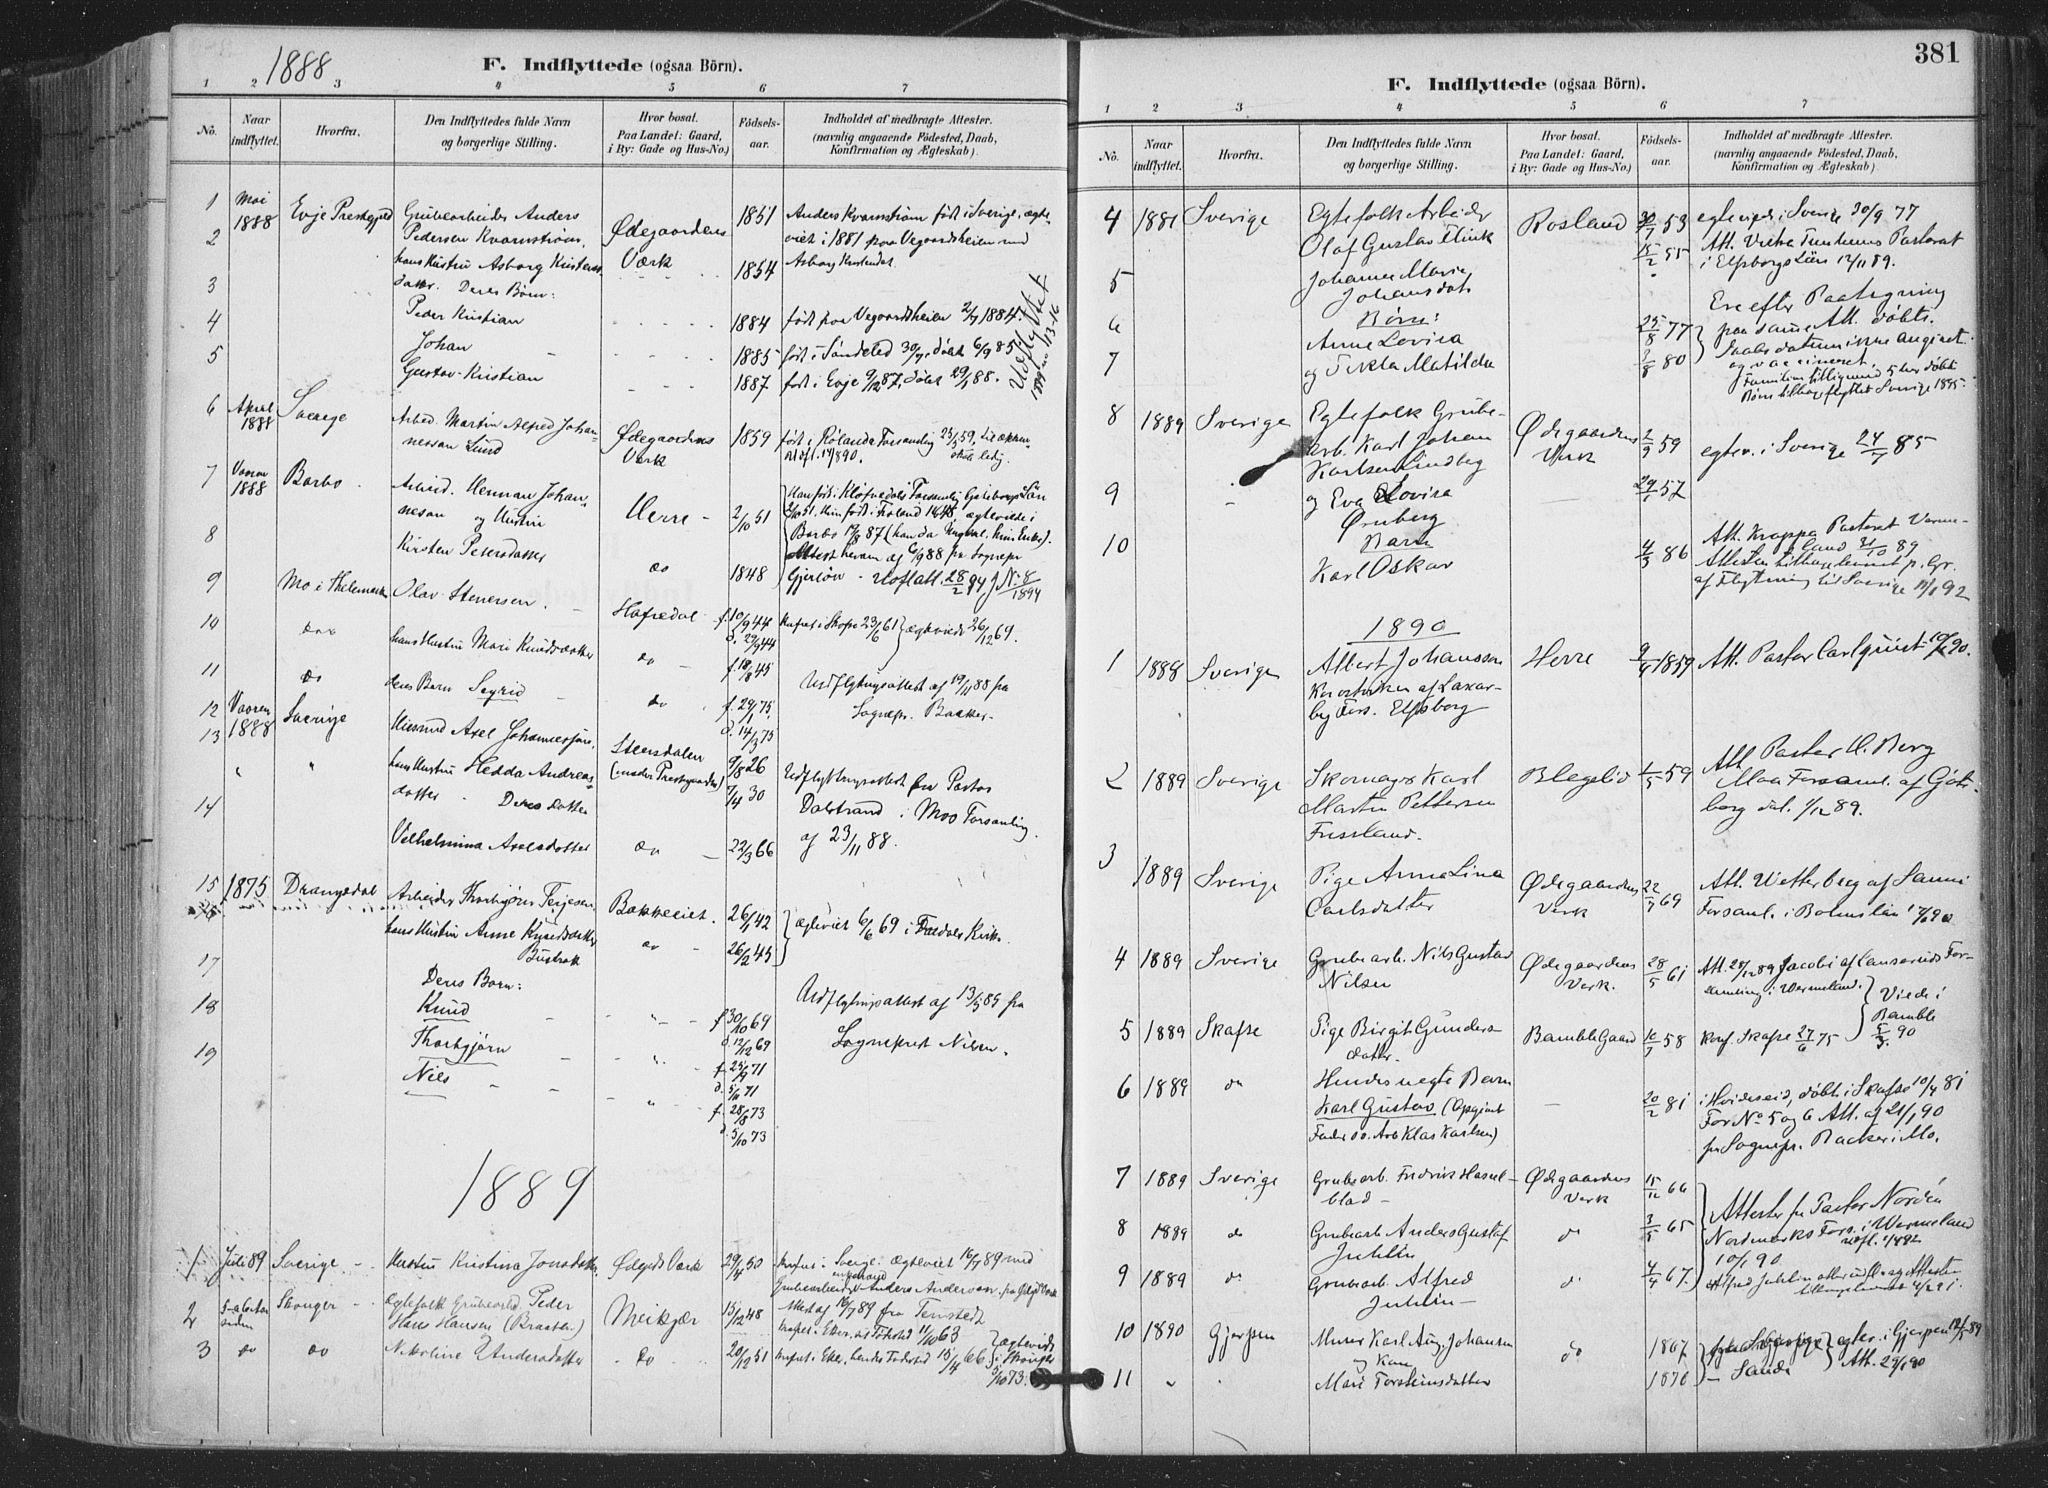 SAKO, Bamble kirkebøker, F/Fa/L0008: Ministerialbok nr. I 8, 1888-1900, s. 381